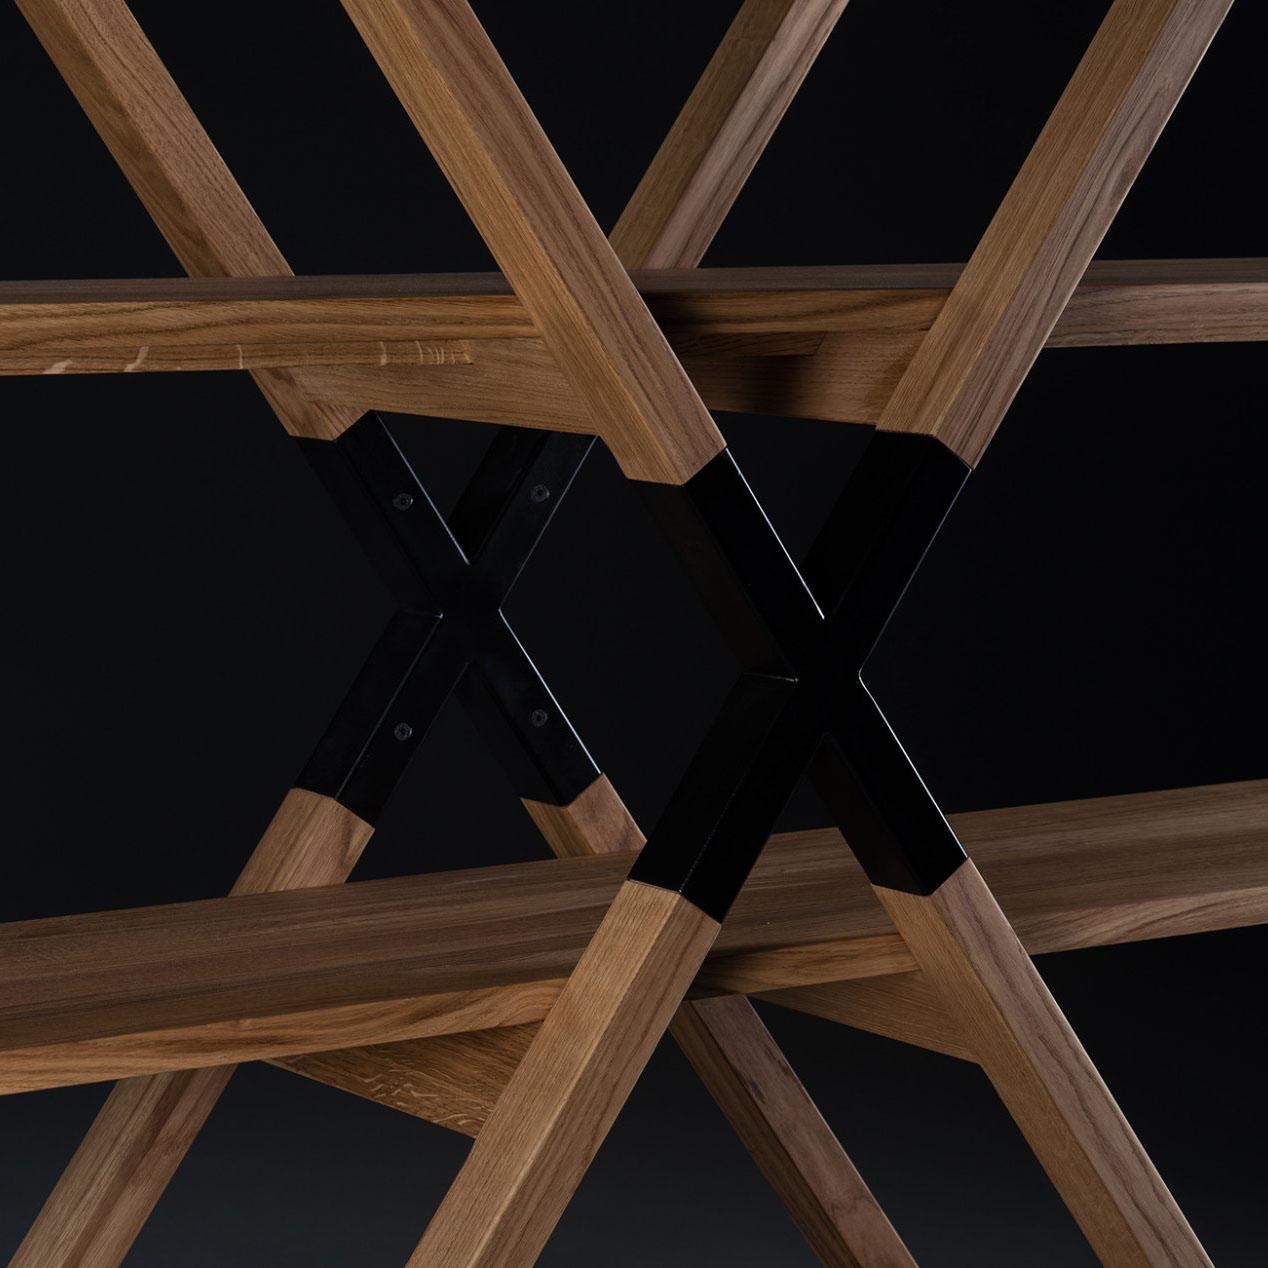 Mueble modular x shelf dise o original y artesano en madera for Mueble modular